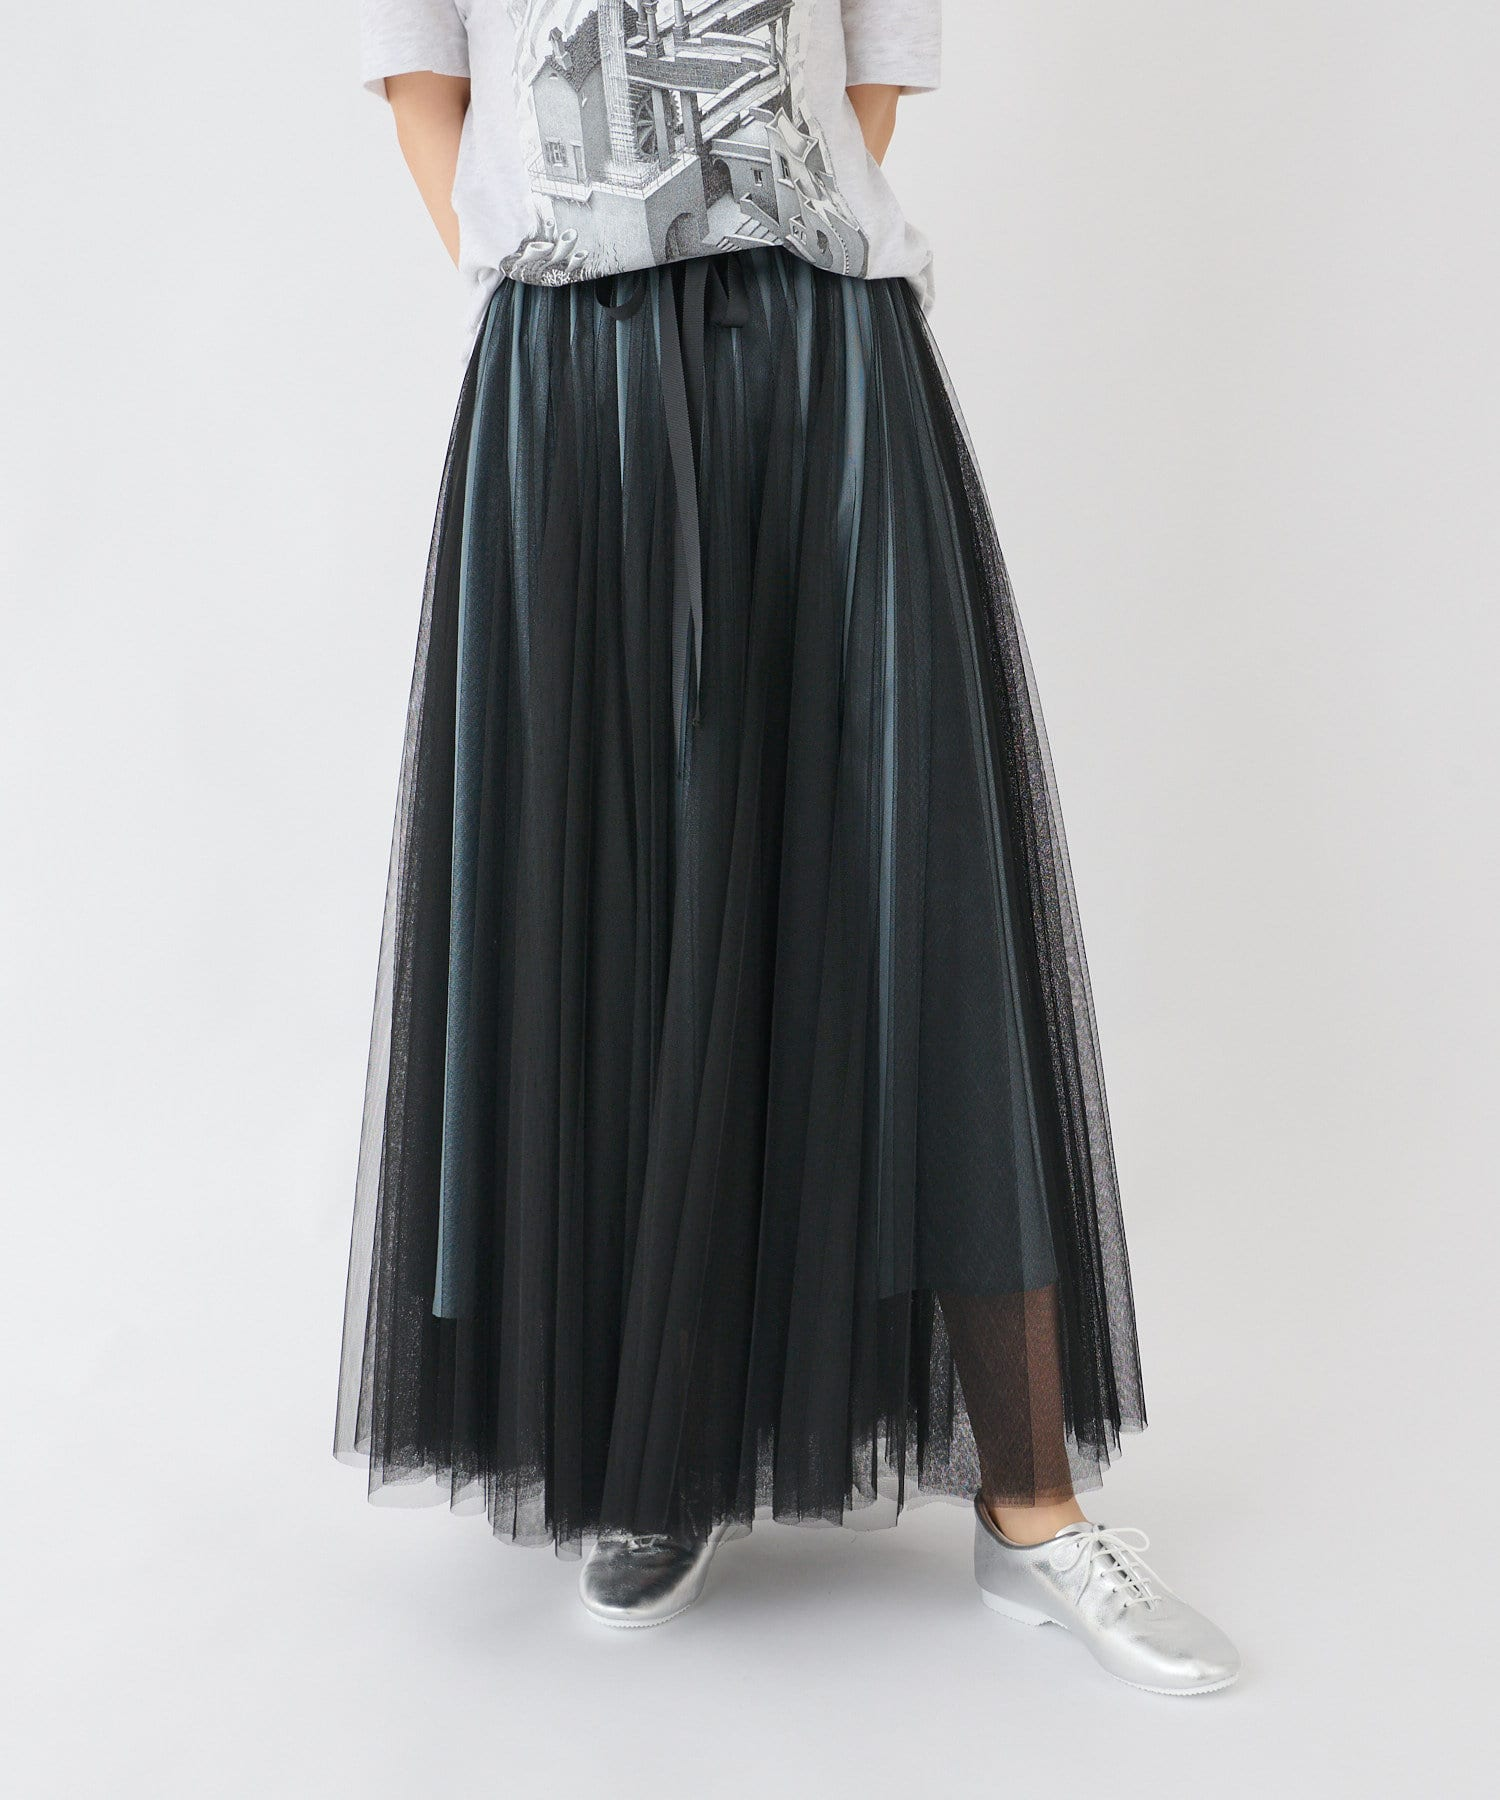 BONbazaar(ボンバザール) 配色チュールスカート